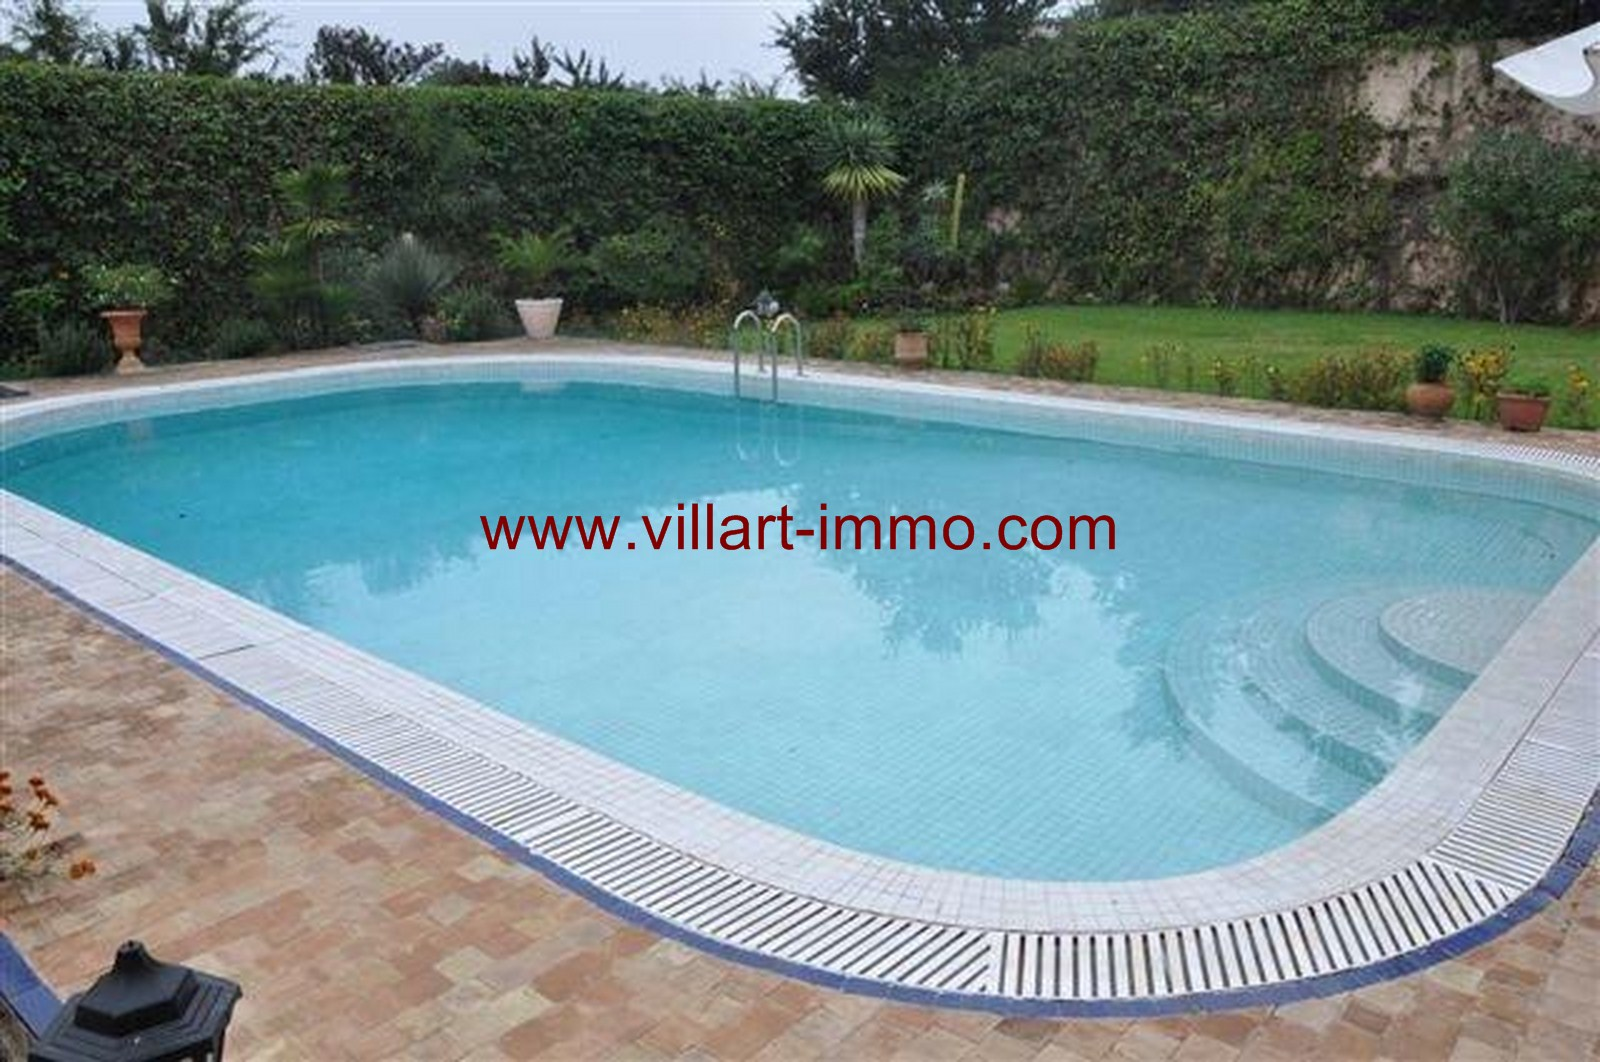 5-vente-villa-tanger-boubana-piscine-vv363-villart-immo